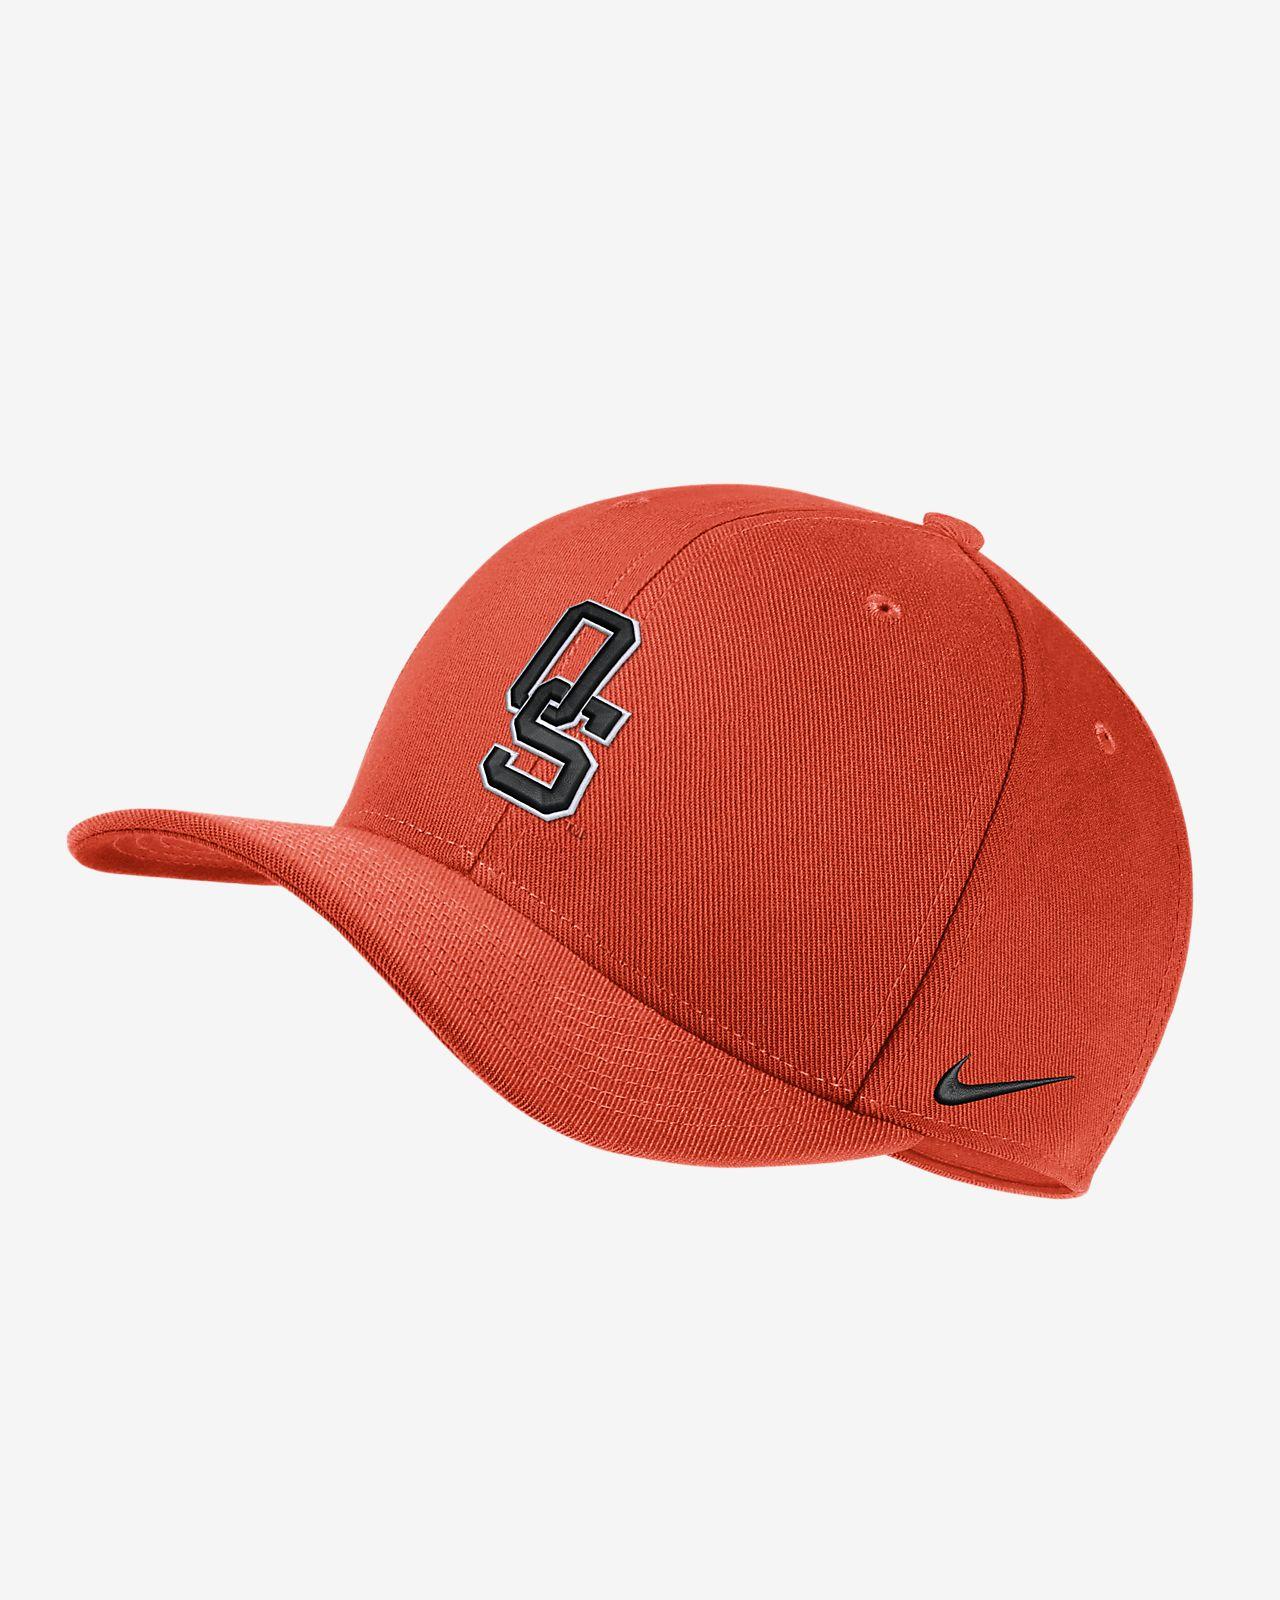 finest selection 9d2e2 c4e04 Nike College Dri-FIT Classic99 Swoosh Flex (Oklahoma State)